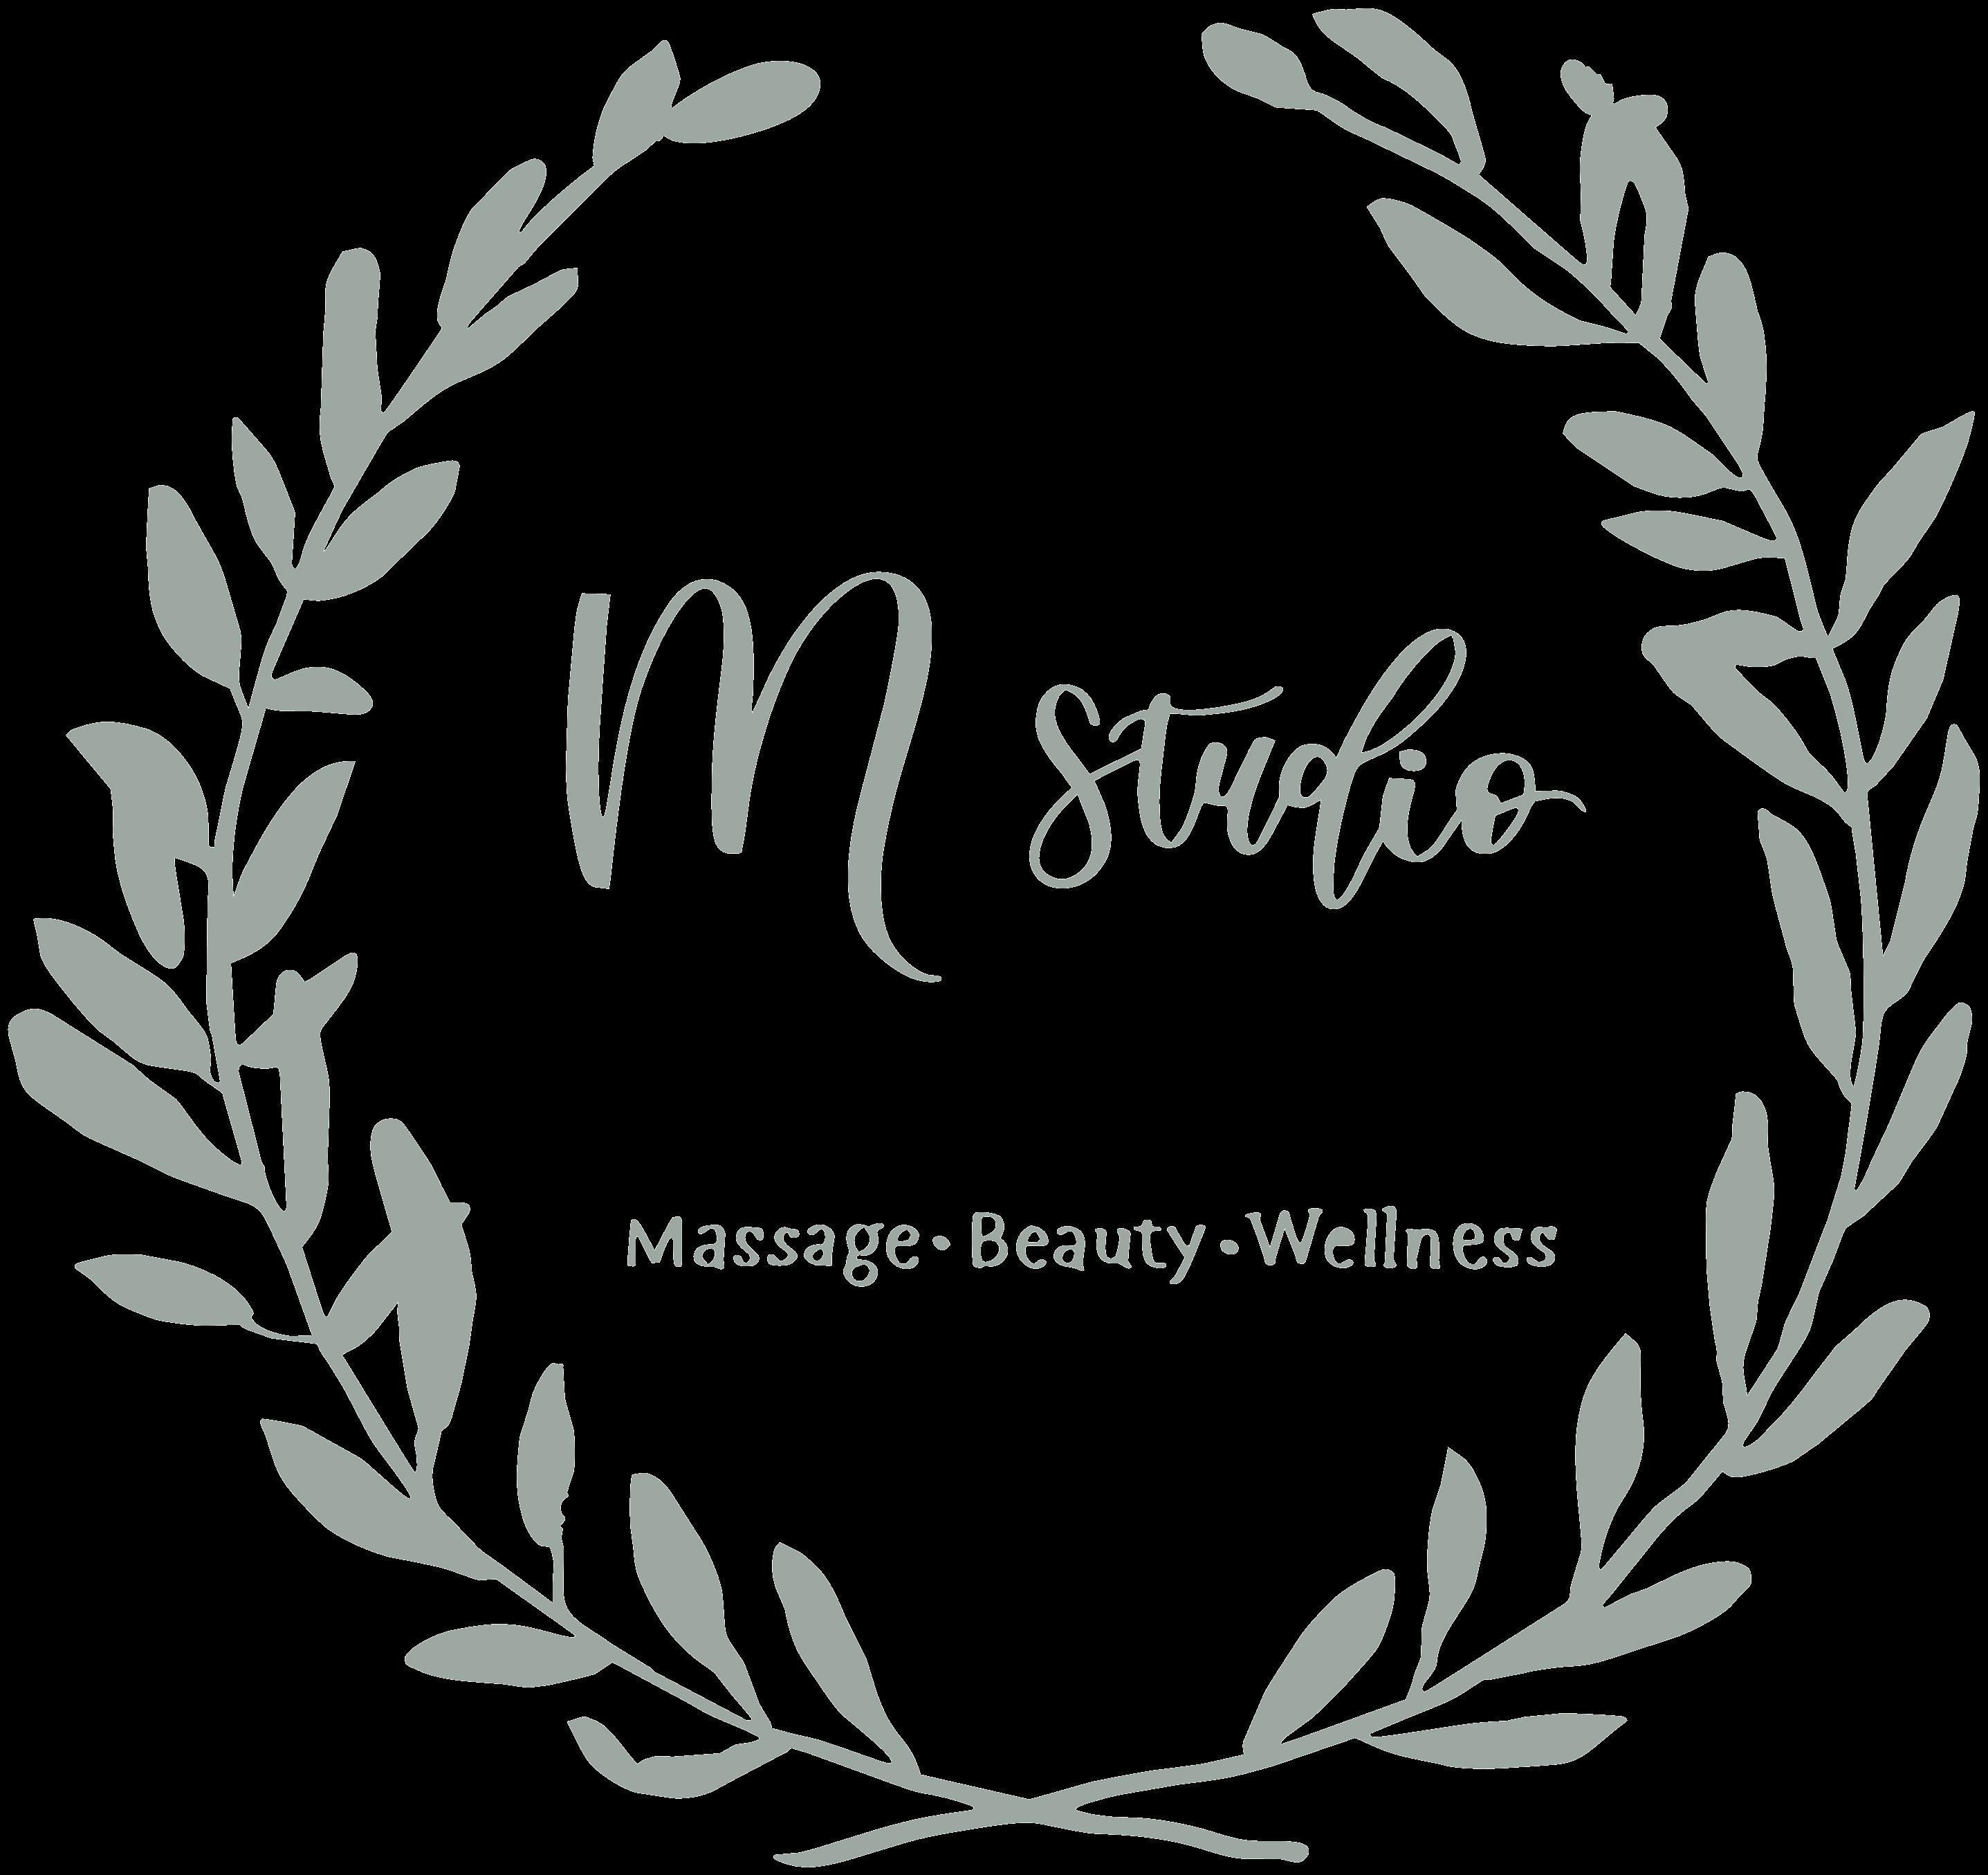 M Studio Wellness Spa, Massage, Facials, Skin, Hair